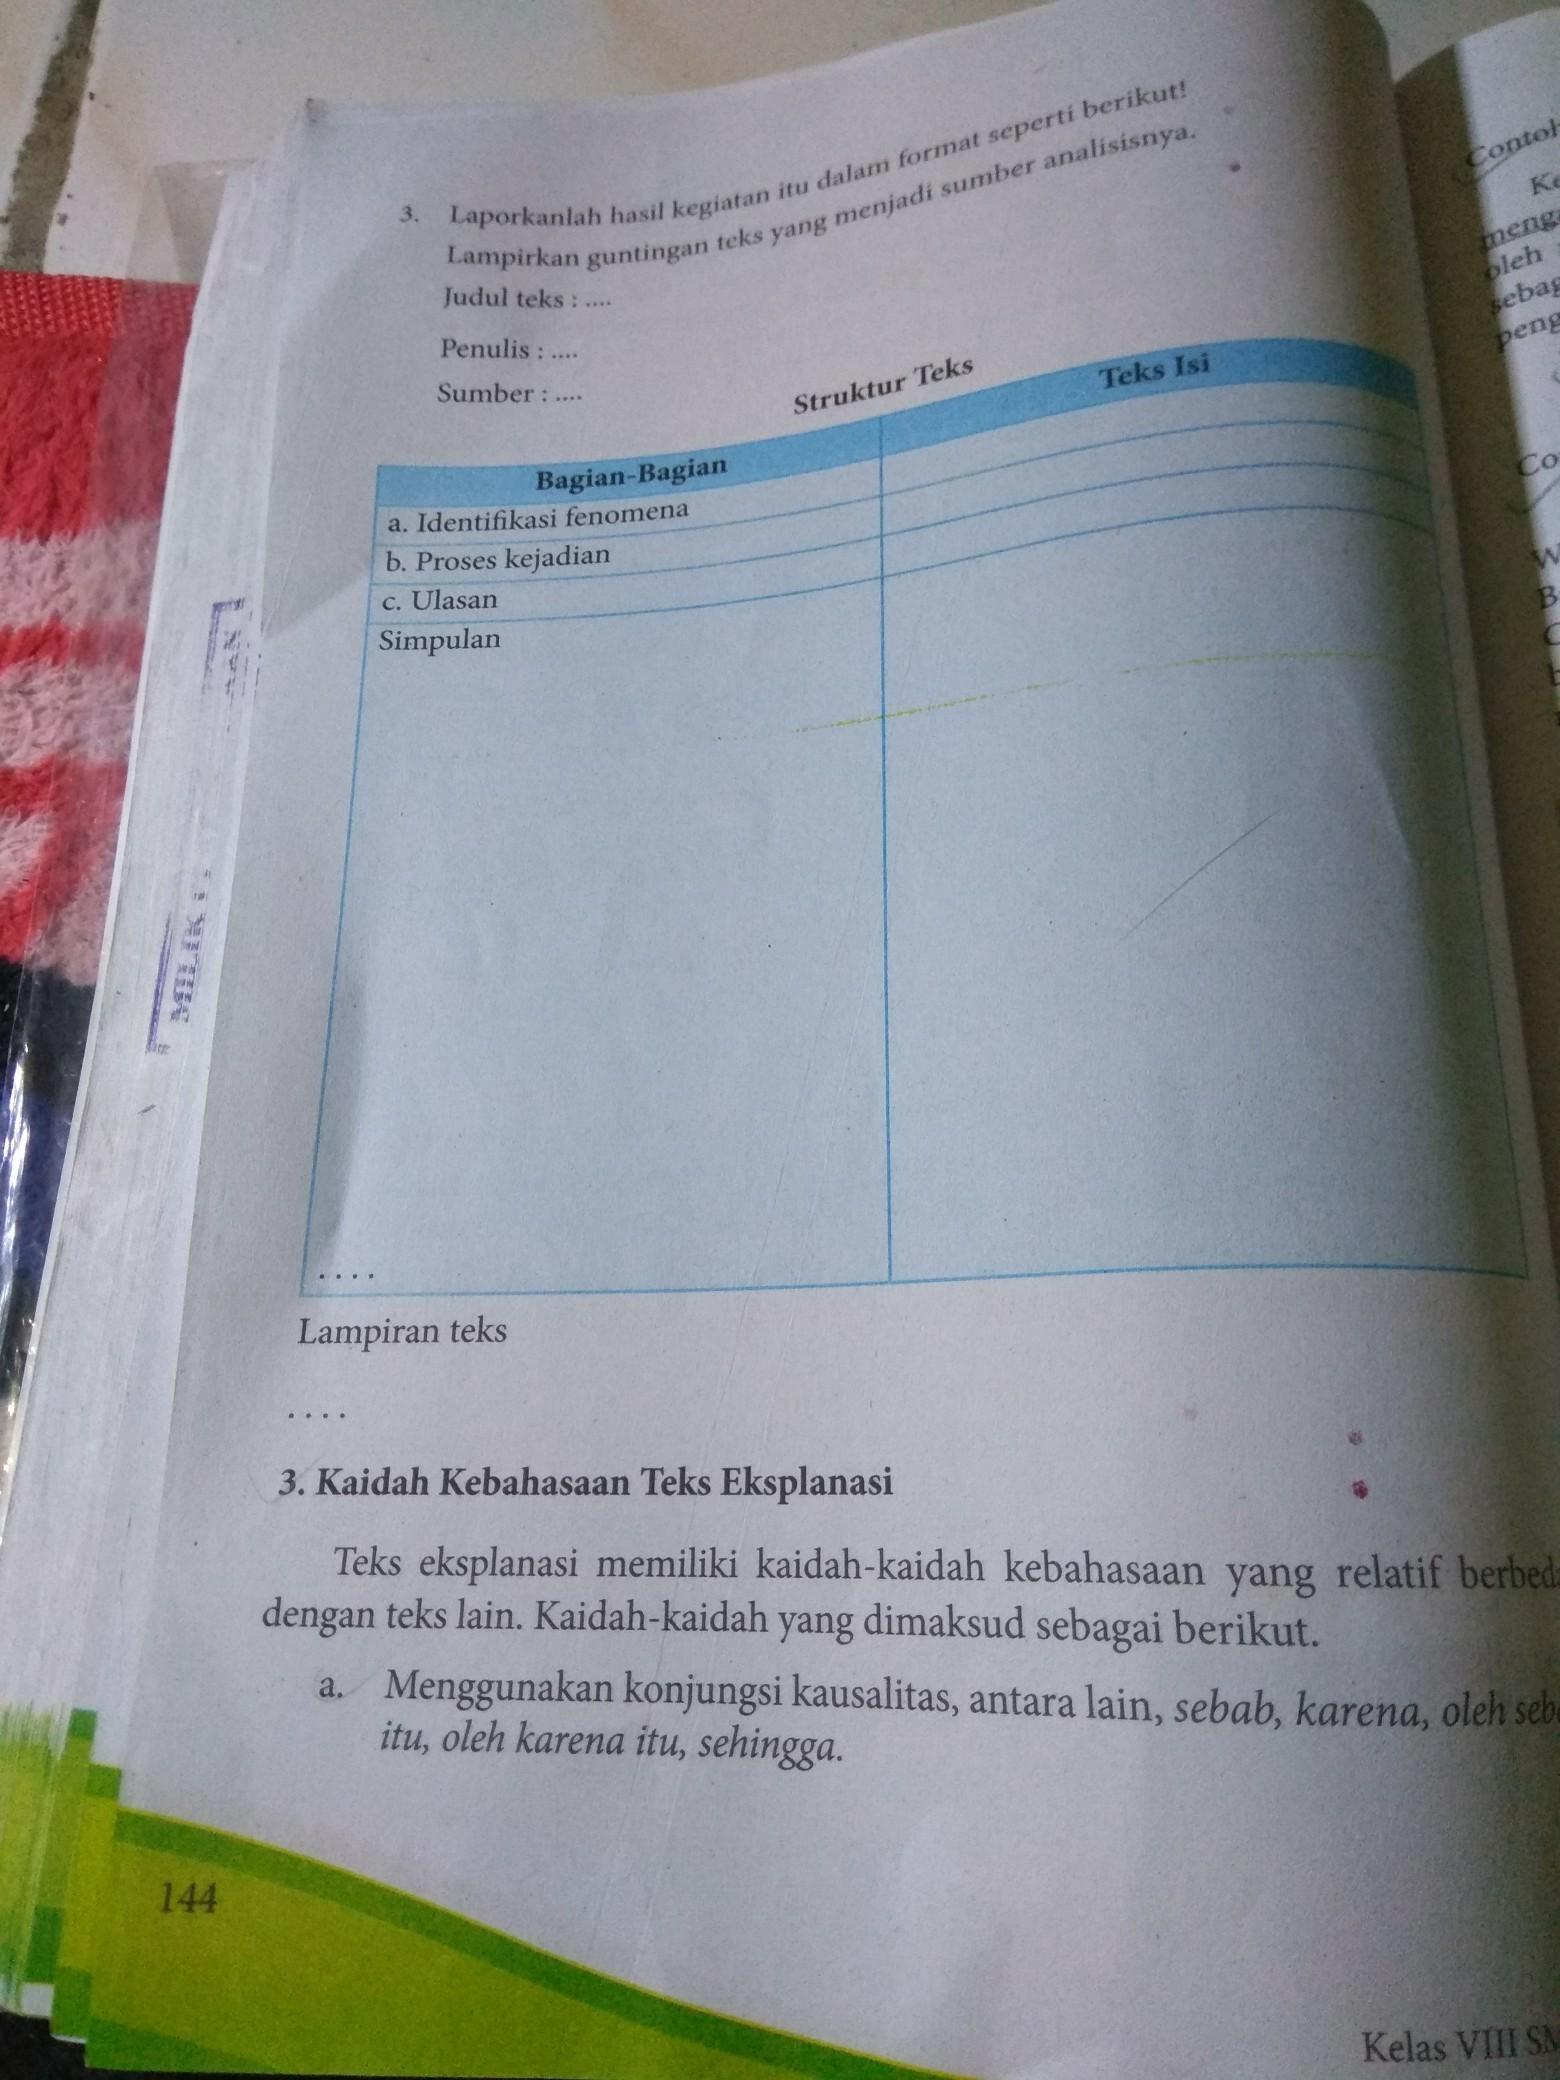 Kegiatan 5.6 Bahasa Indonesia Kelas 8 : kegiatan, bahasa, indonesia, kelas, Tugas, Bahasa, Indonesia, Kelas, Halaman, Brainly.co.id